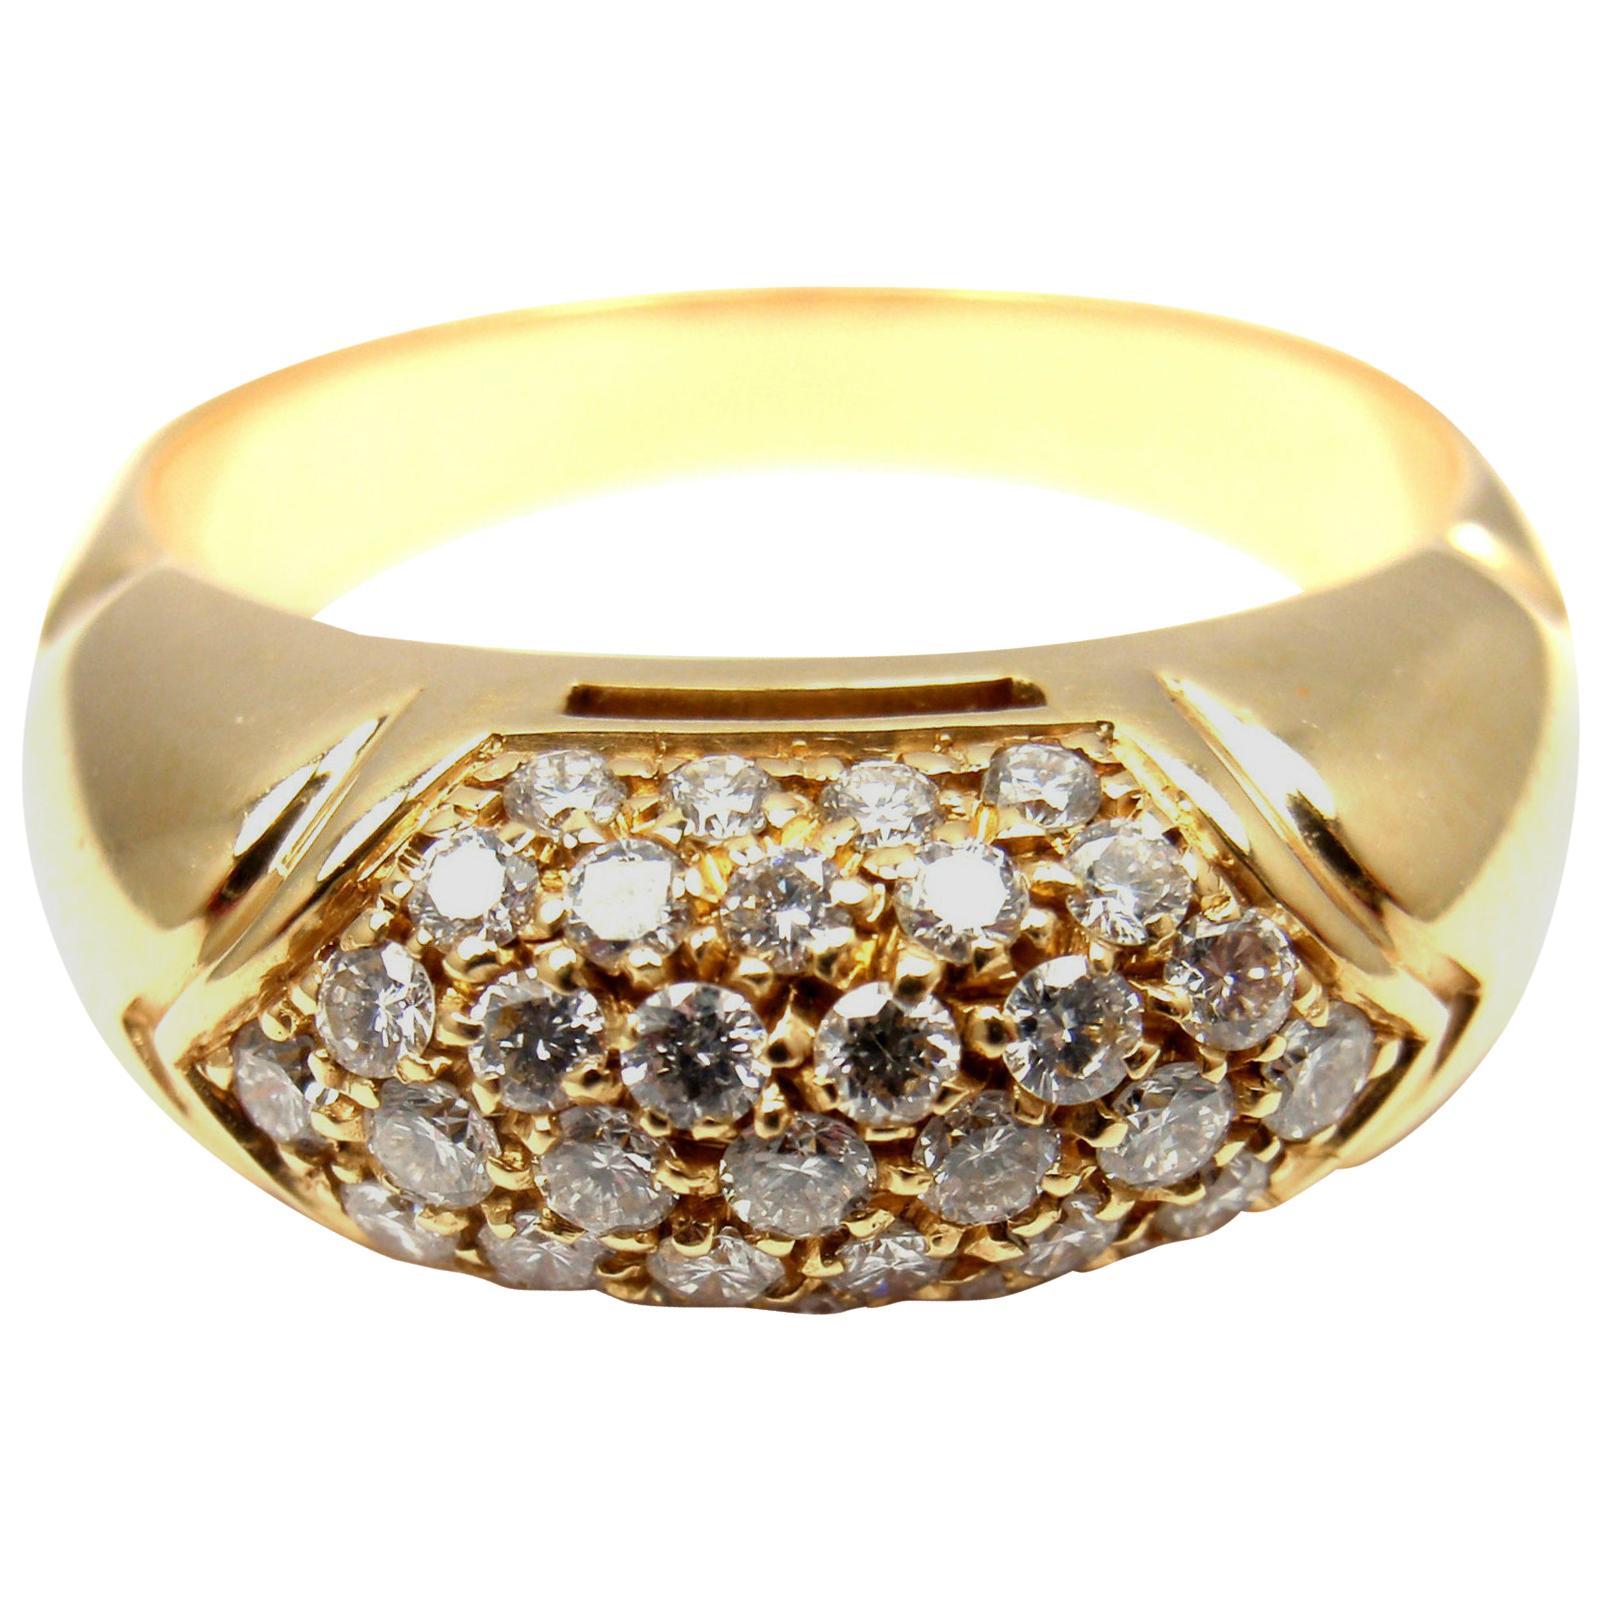 Bulgari Bvlgari Diamond Yellow Gold Band Ring